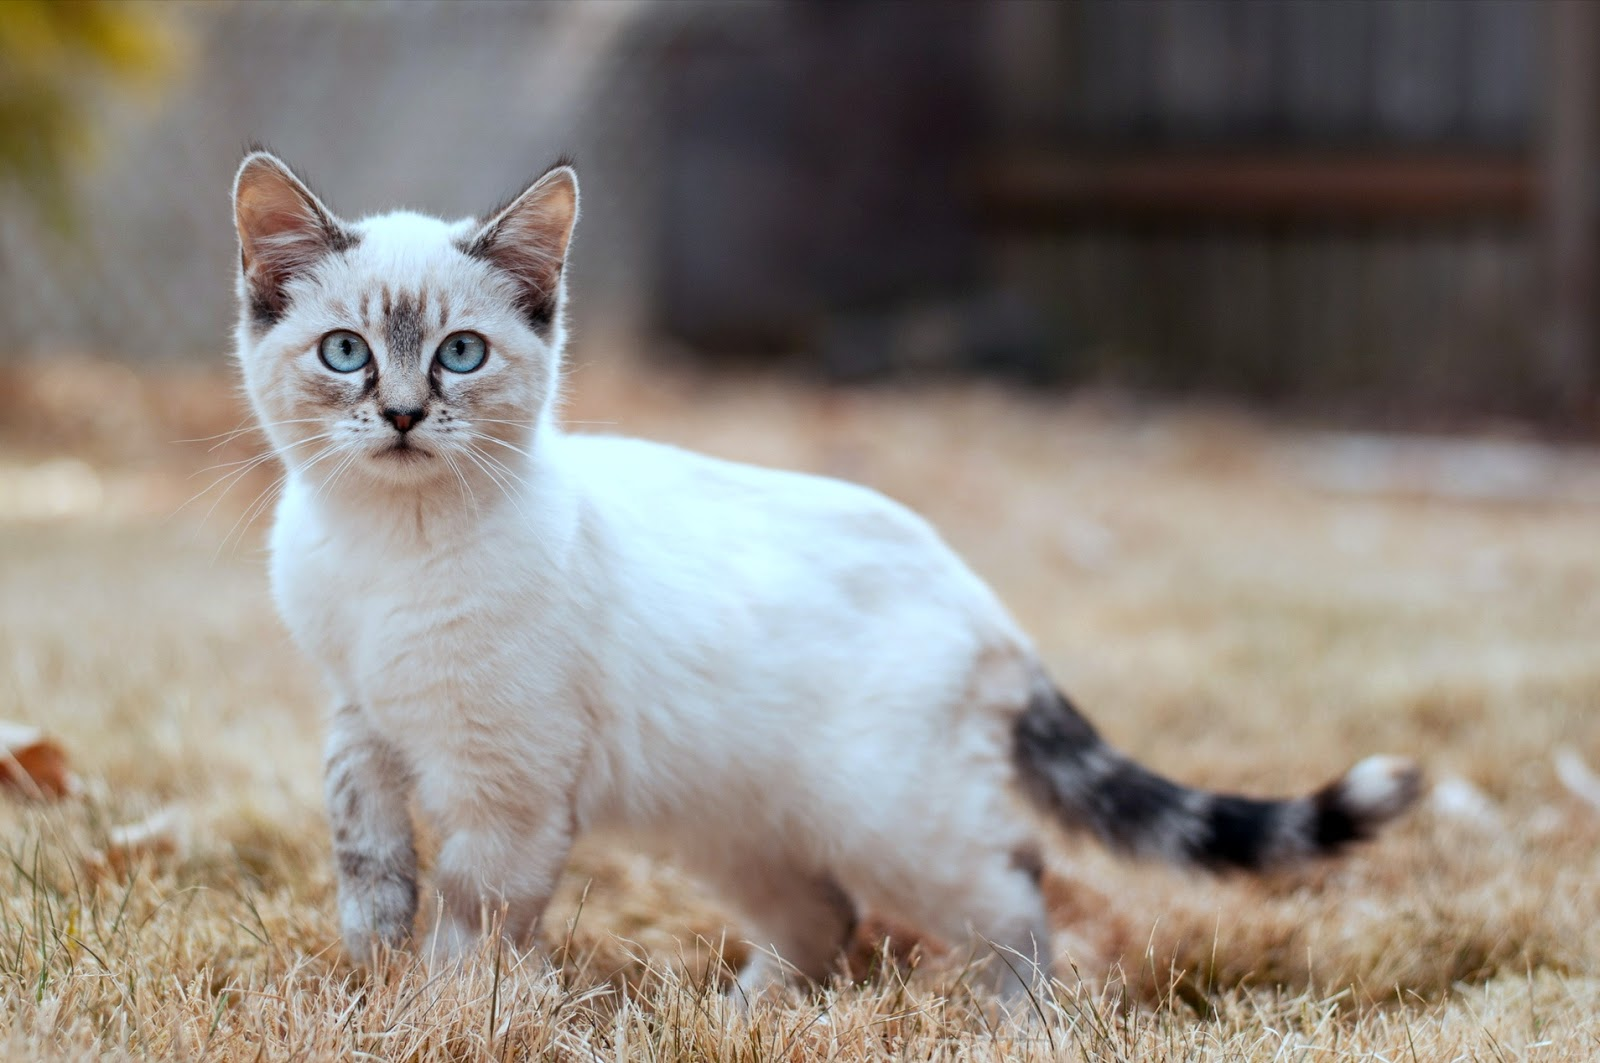 Gambar Kucing Ambeien godean.web.id